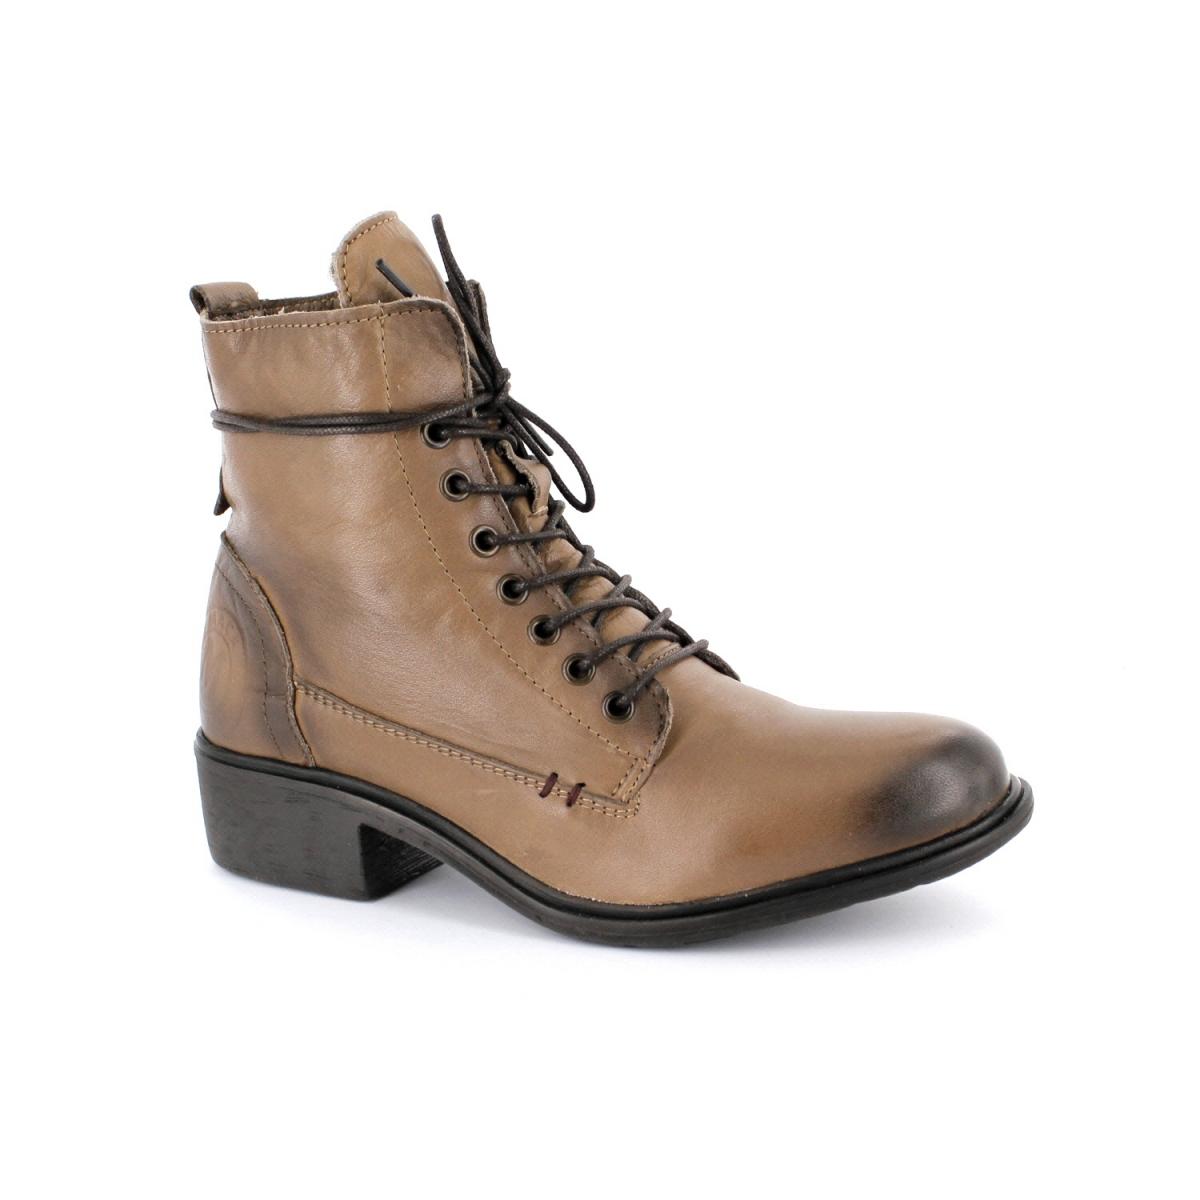 maca kitzb hel boots in taupe hillenhinrichs schuhmode online kaufen hillenhinrichs. Black Bedroom Furniture Sets. Home Design Ideas